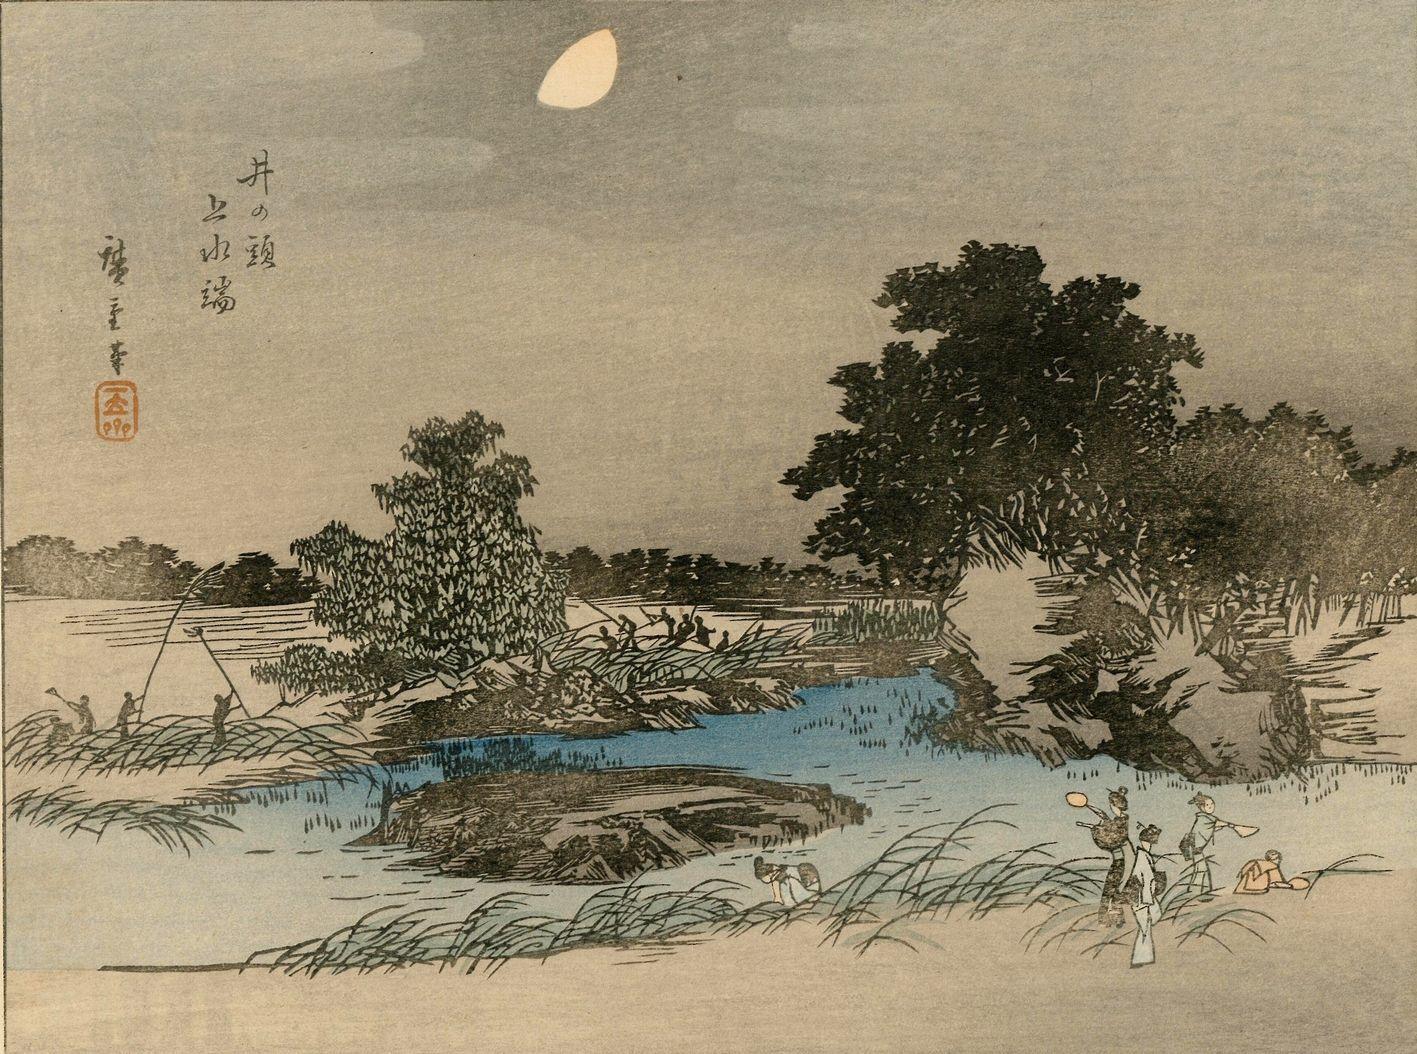 vends &quot&#x3B;souvenirs d'EDO&quot&#x3B; rare série de Hiroshige